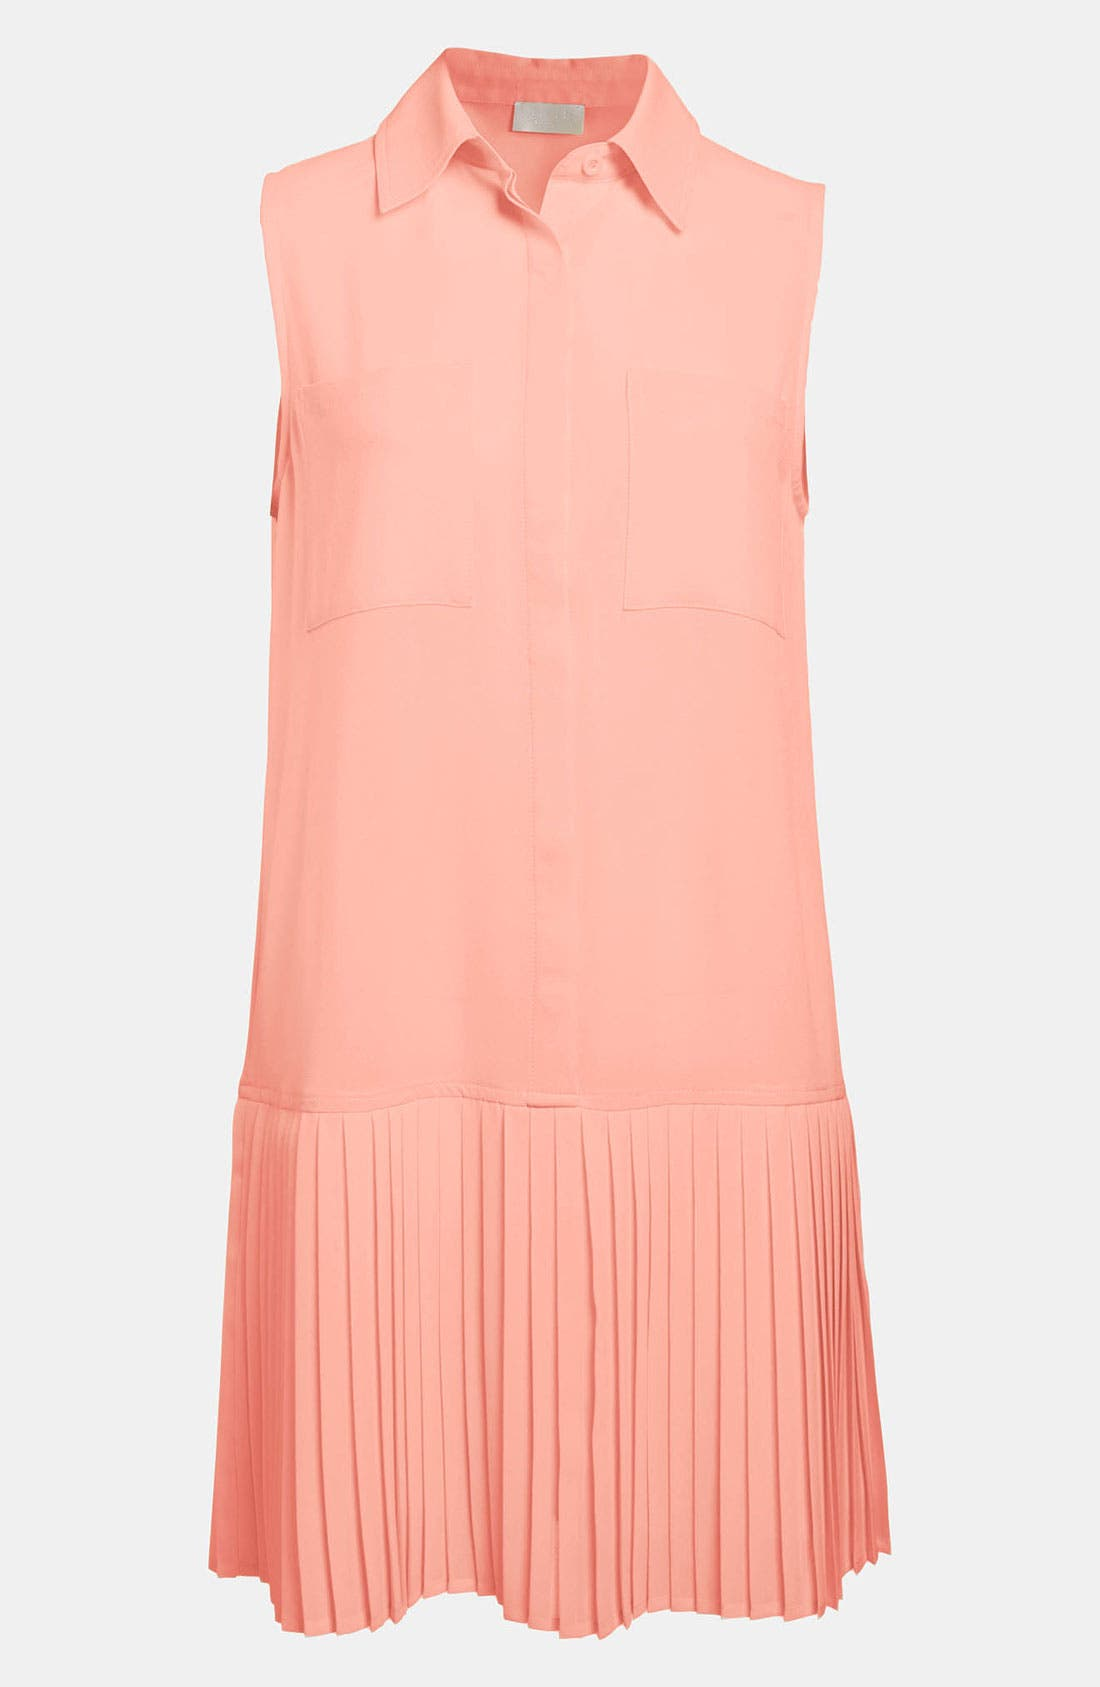 Main Image - ASTR Pleated Skirt Drop Waist Dress